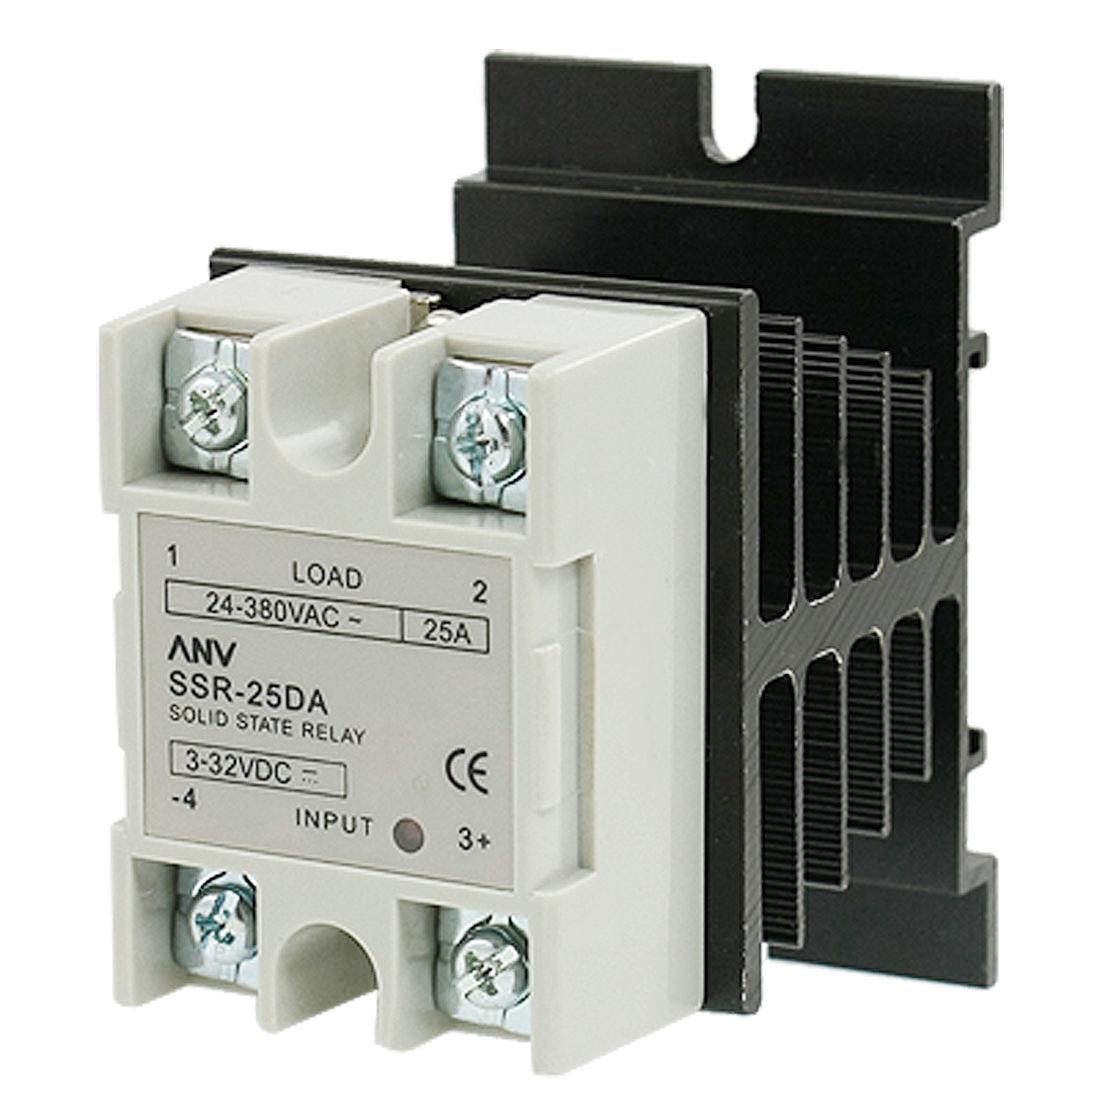 SSR-25 DA 25A 3-32V DC / 24-380V AC Solid State Relay + Heat Sink